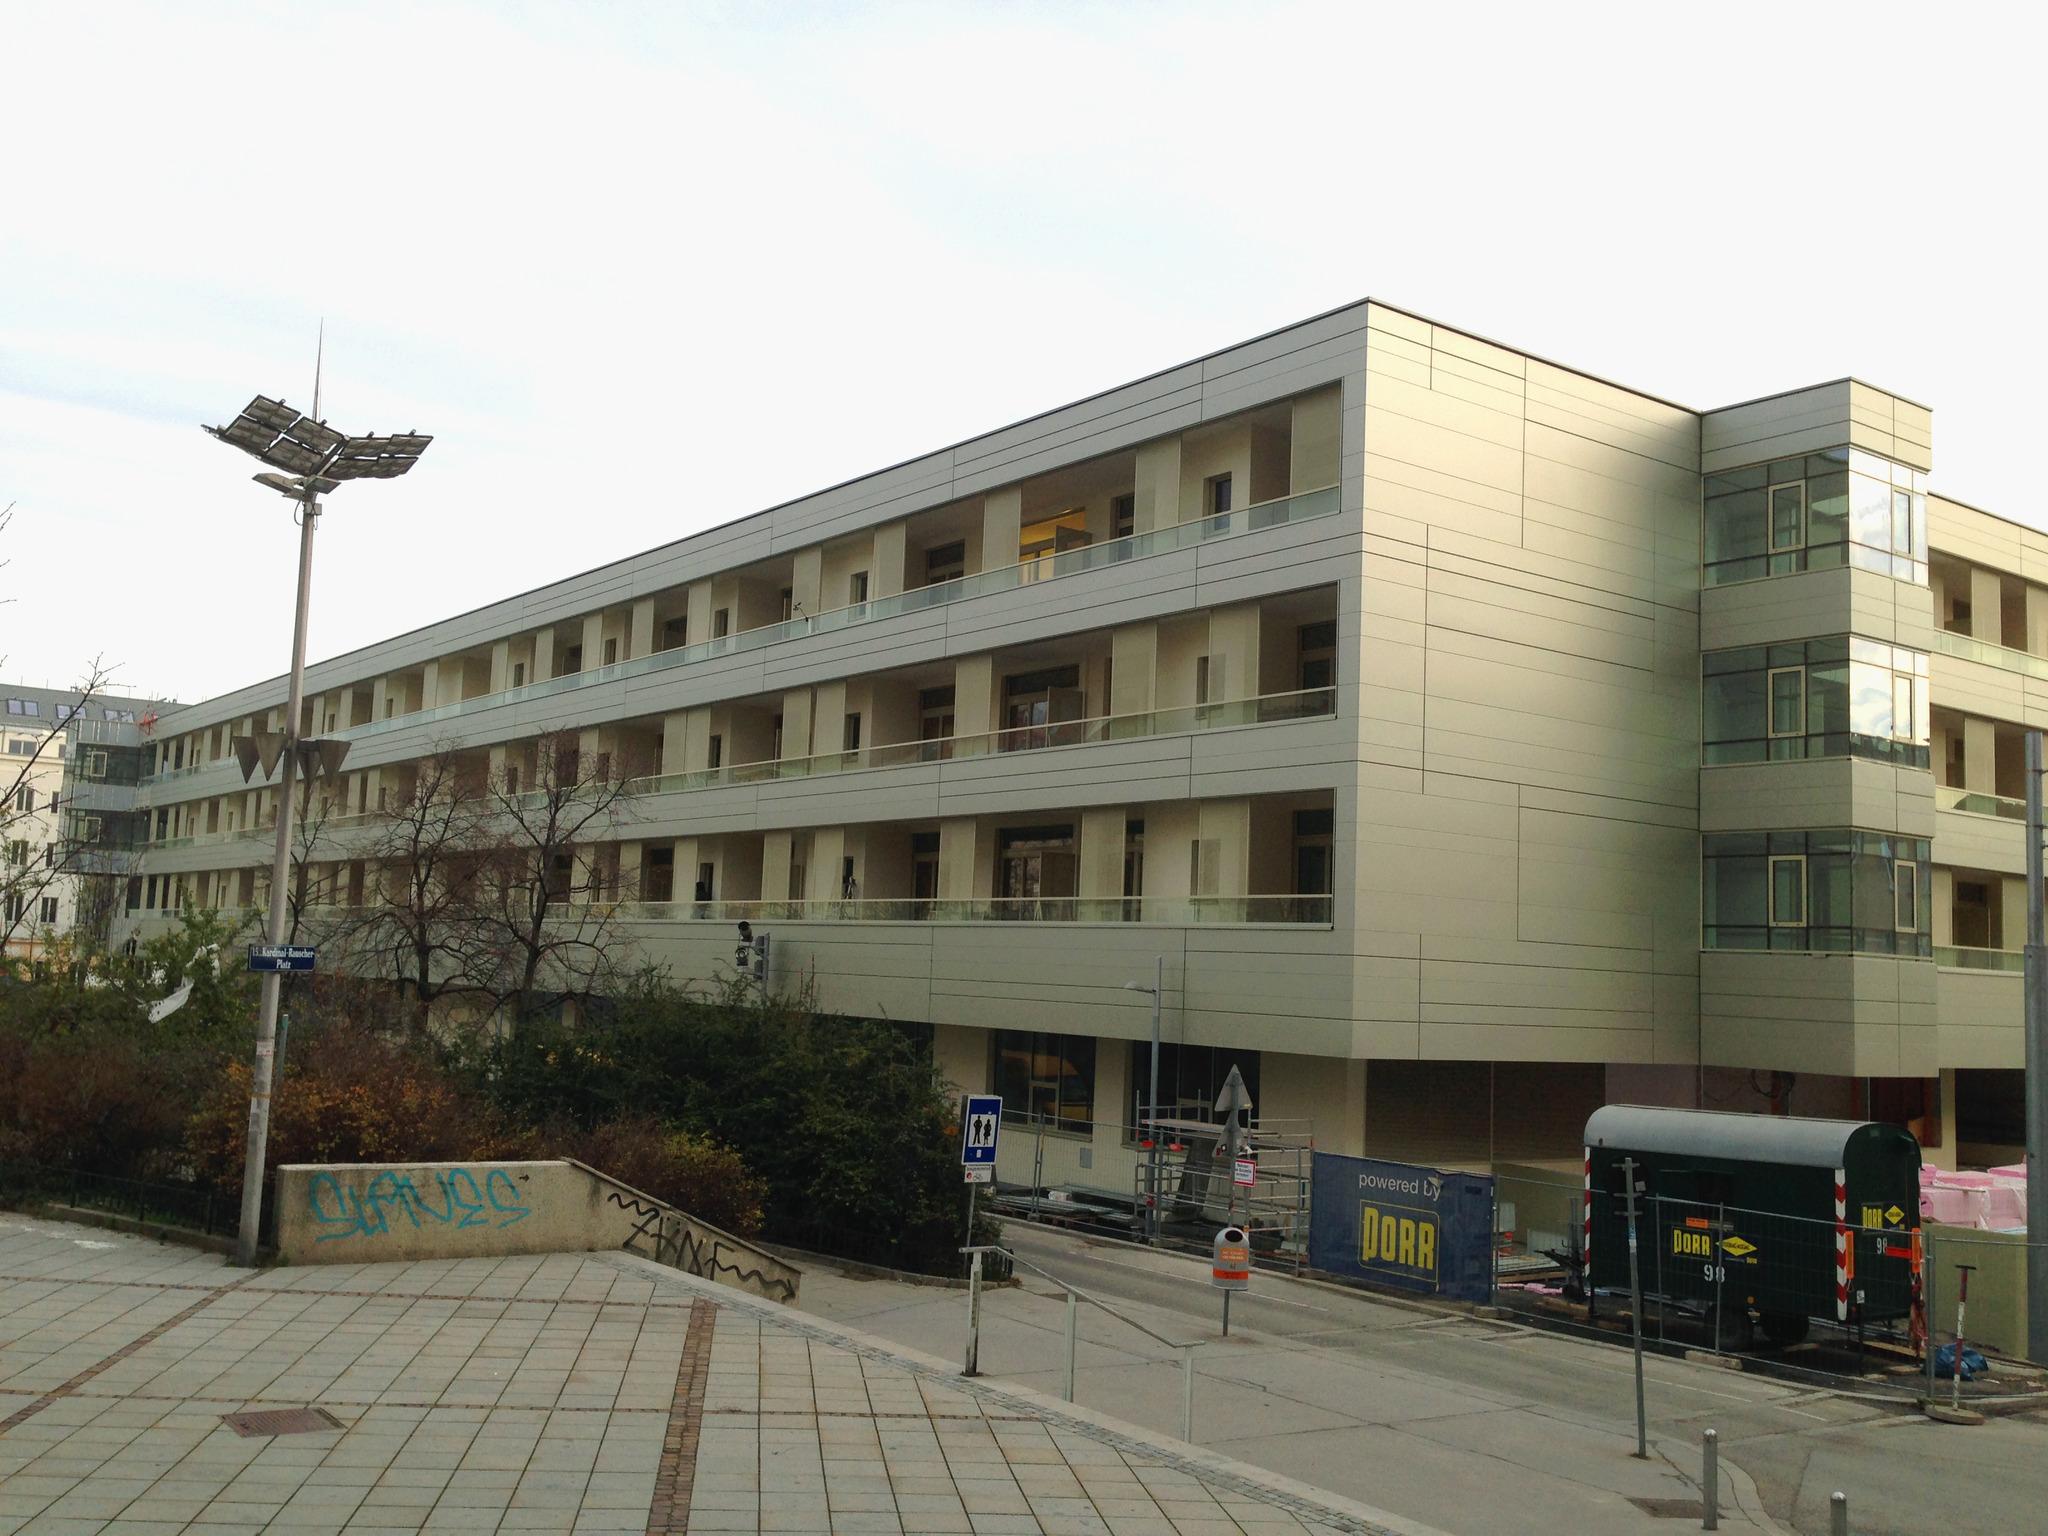 Fünfhaus